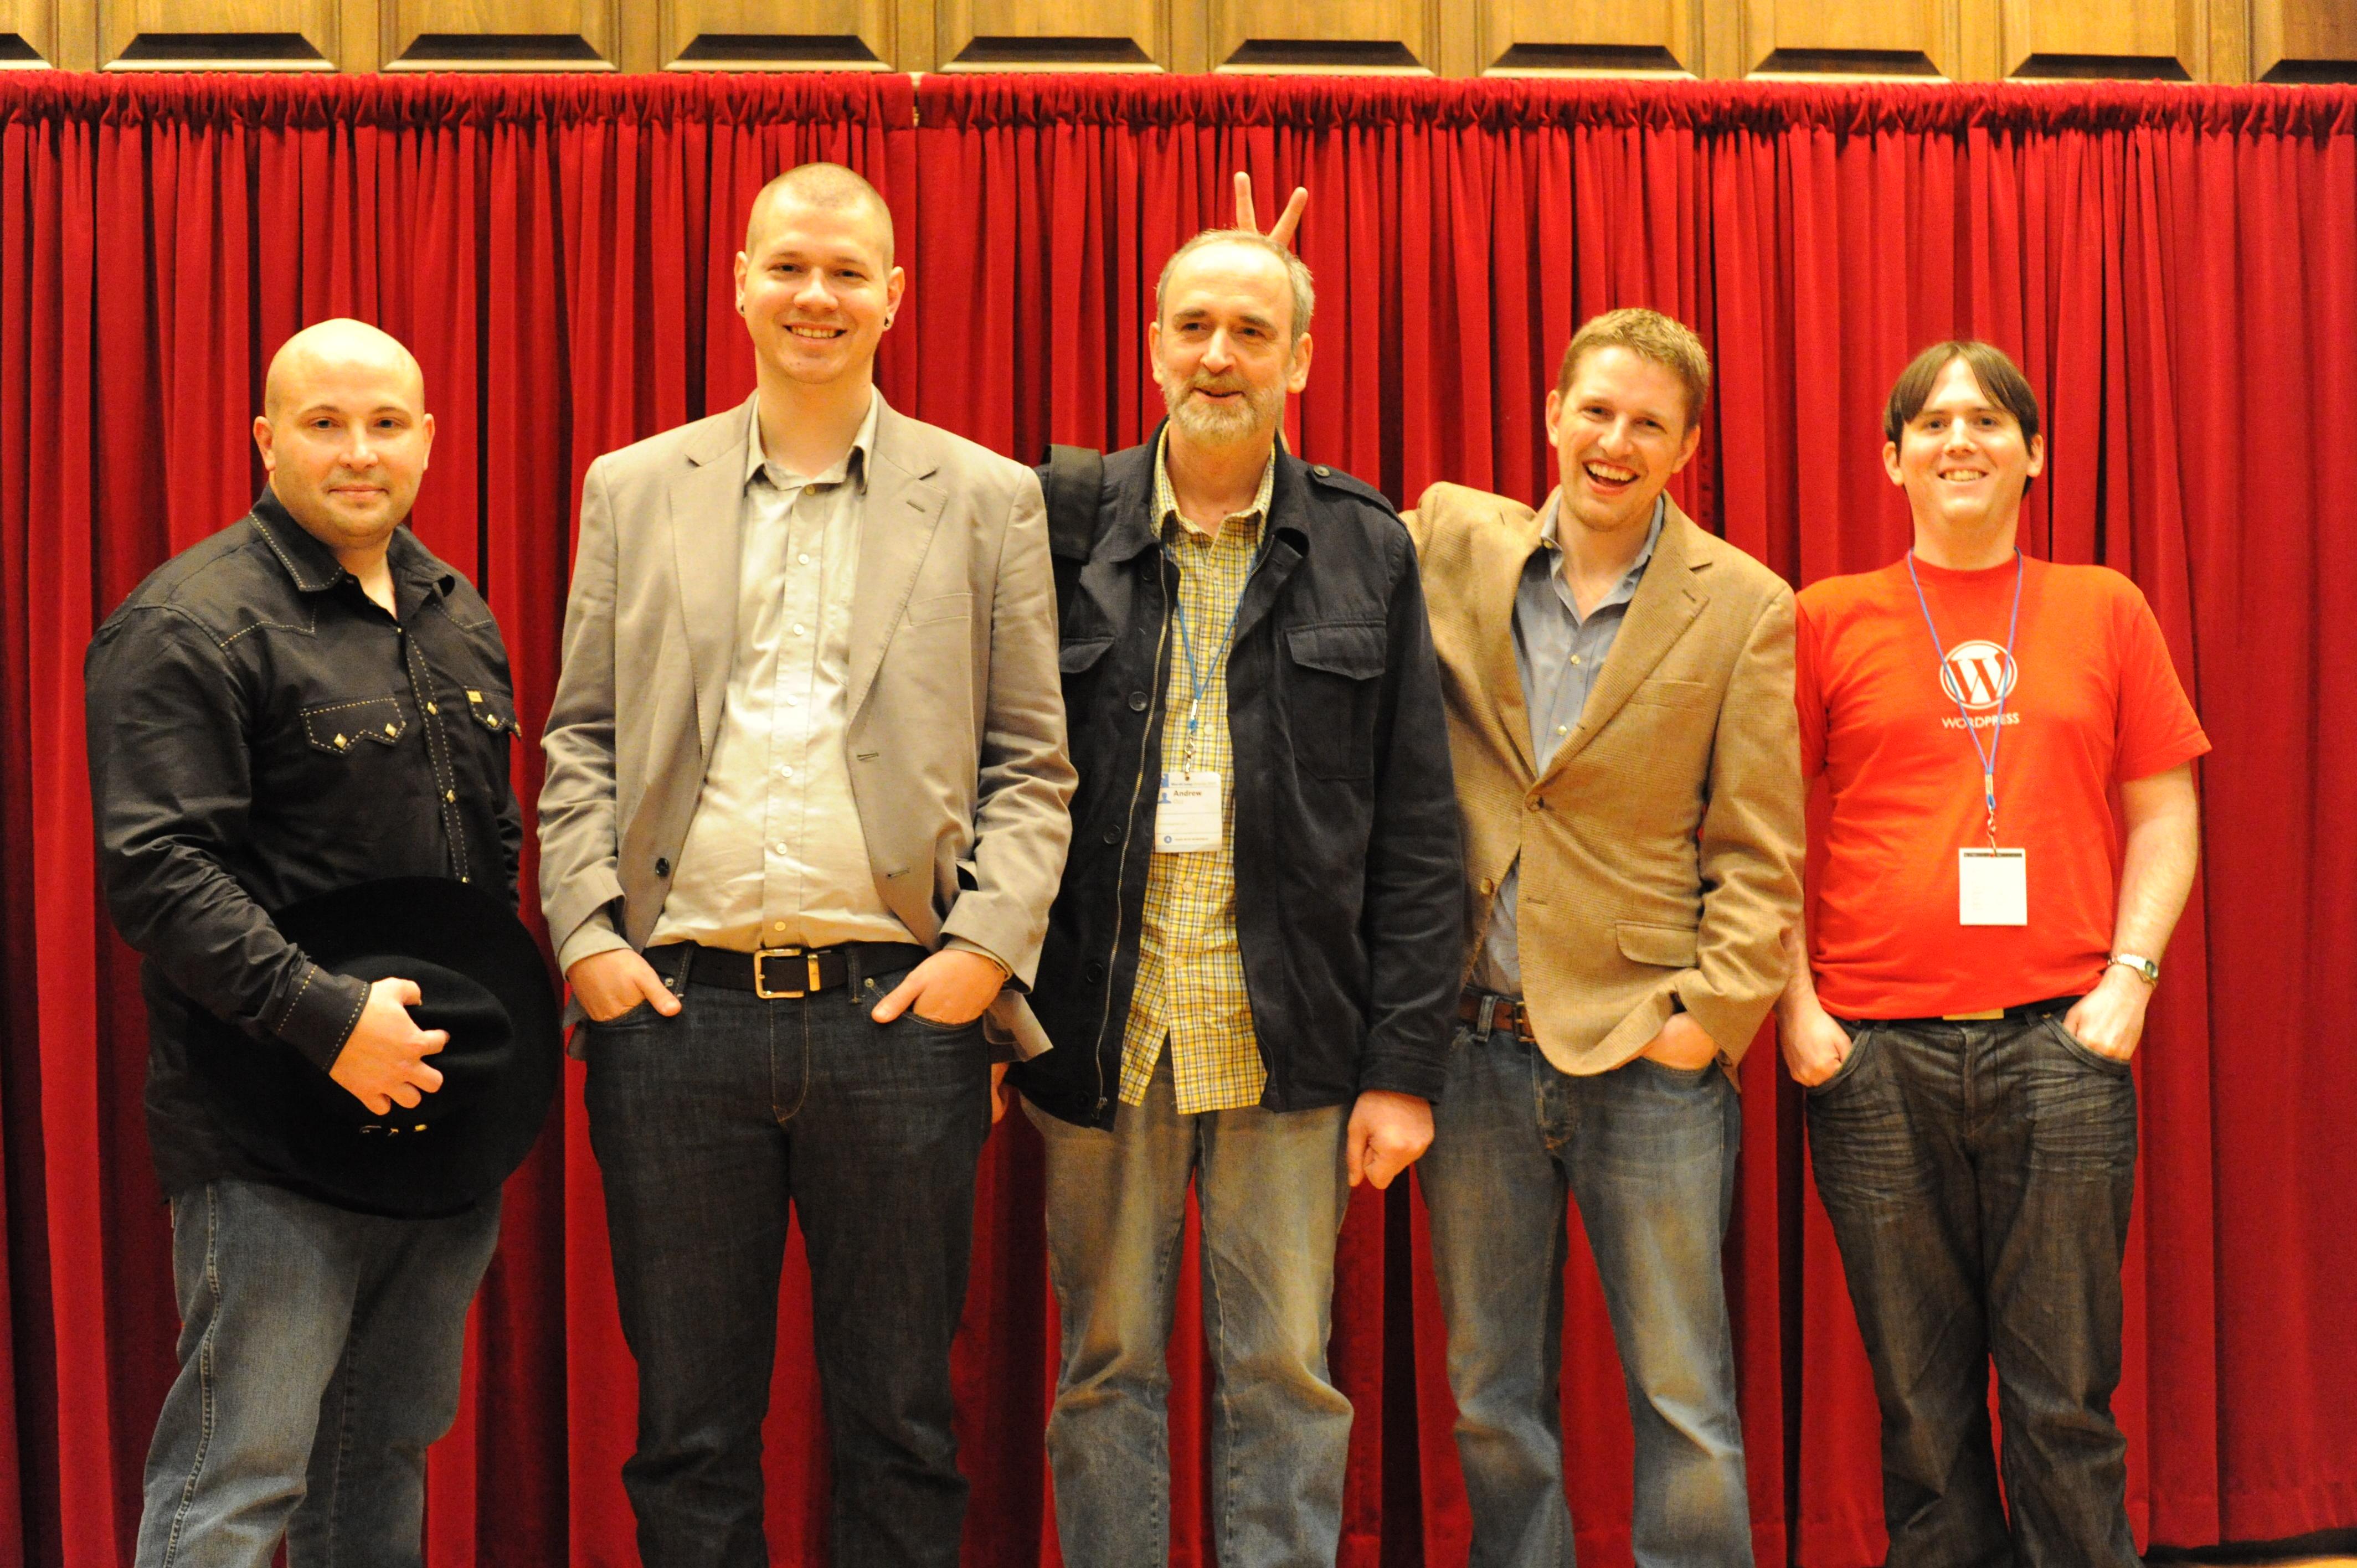 Matt Mullenweg, Ryan Boren, Mark Jaquith, Andrew Ozz, Peter Westwood2 Comments